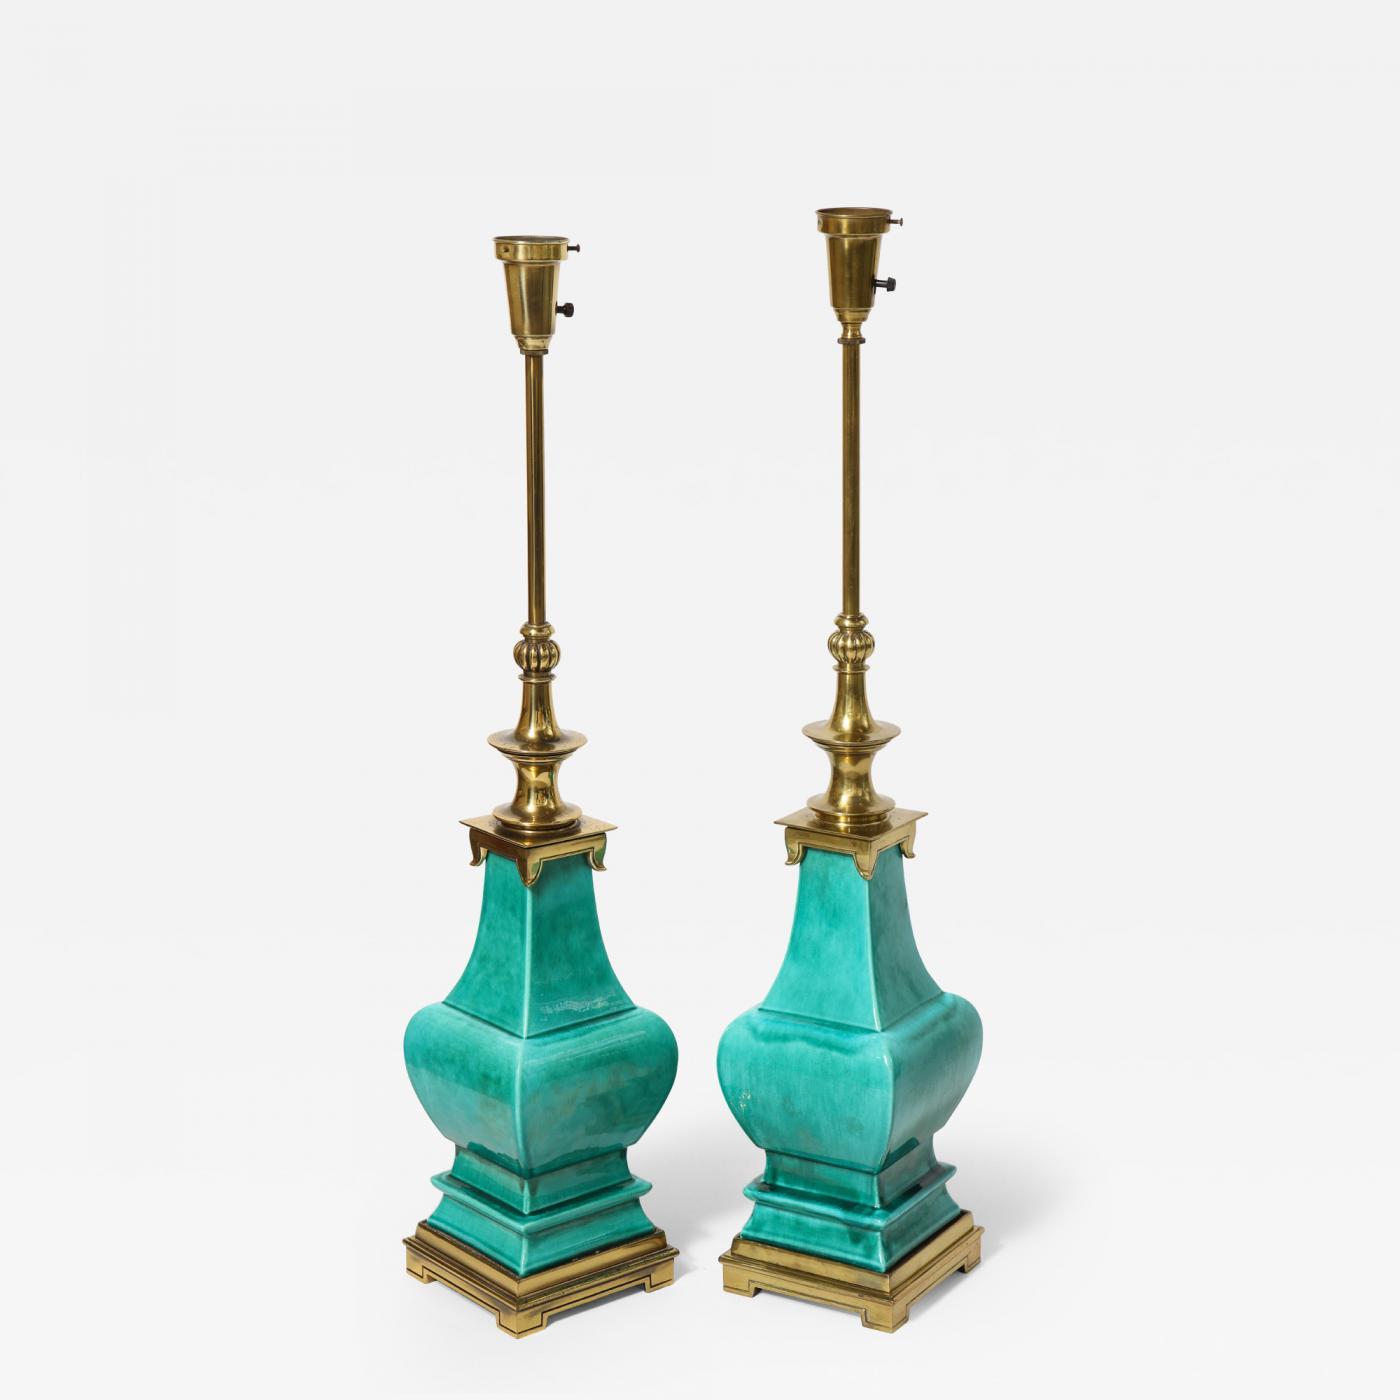 Pair of jade porcelain lamps by stiffel lamp co